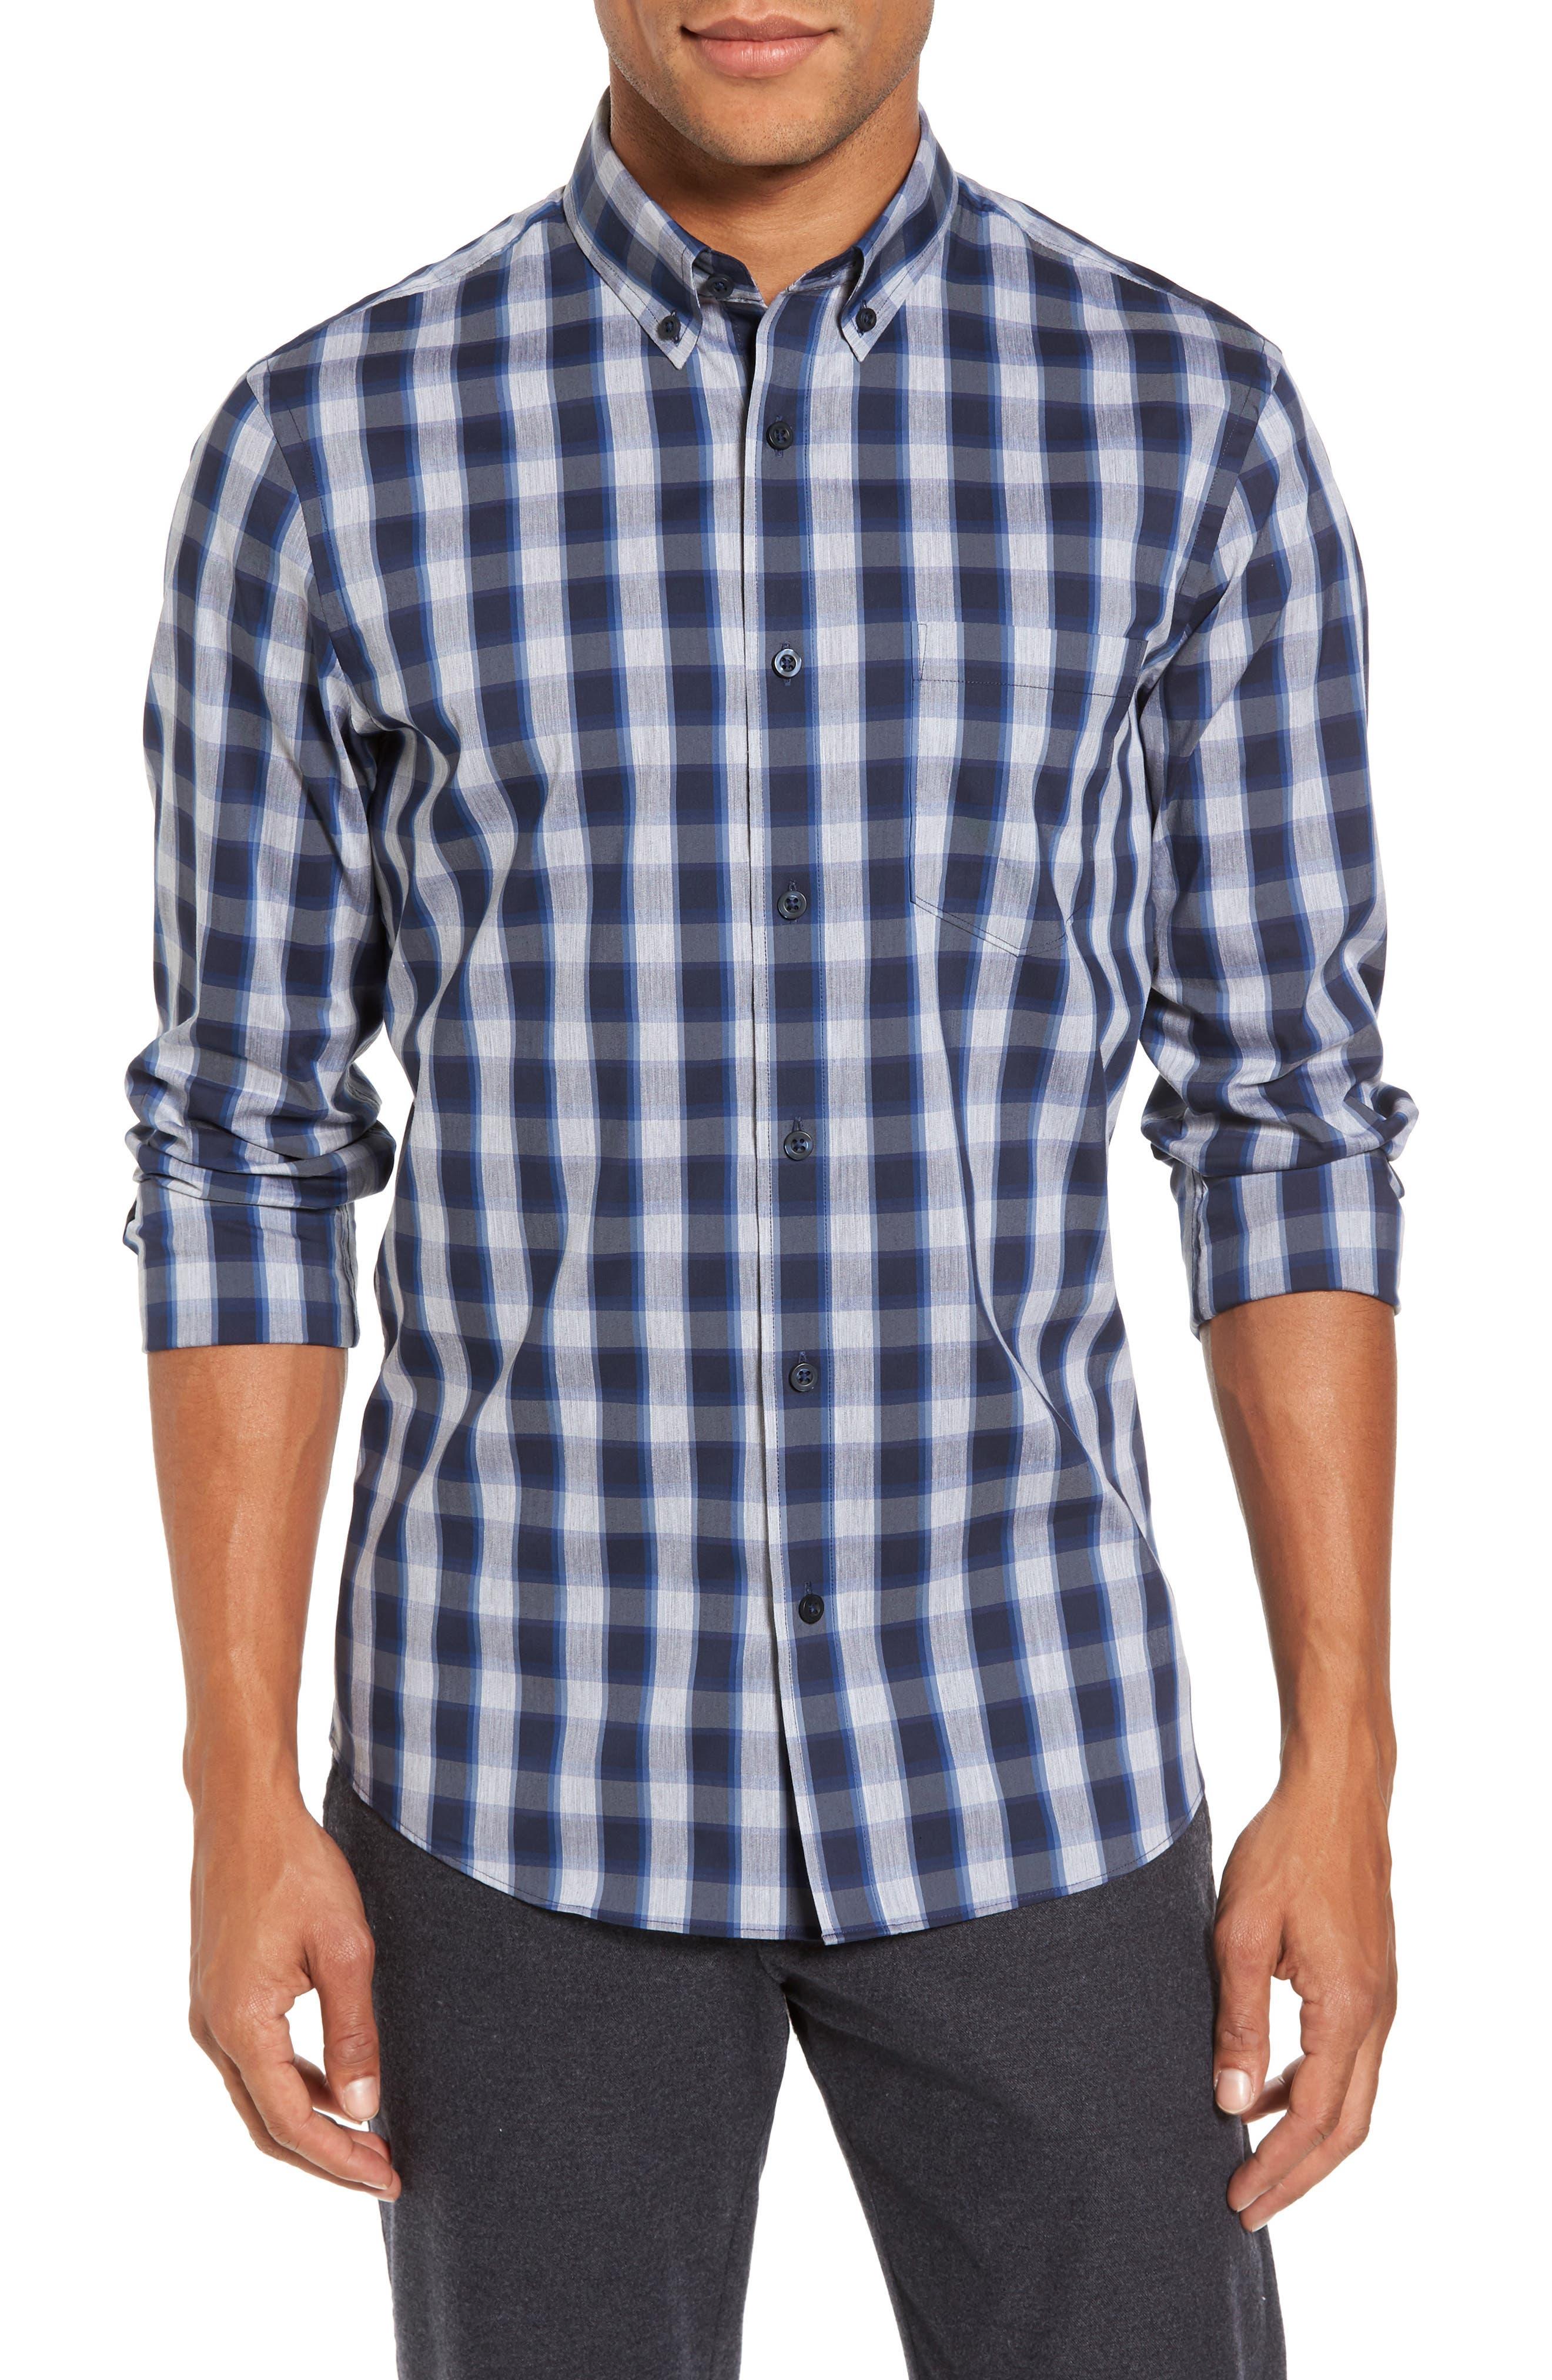 Main Image - Nordstrom Men's Shop Spade Tech-Smart Trim Fit Check Sport Shirt